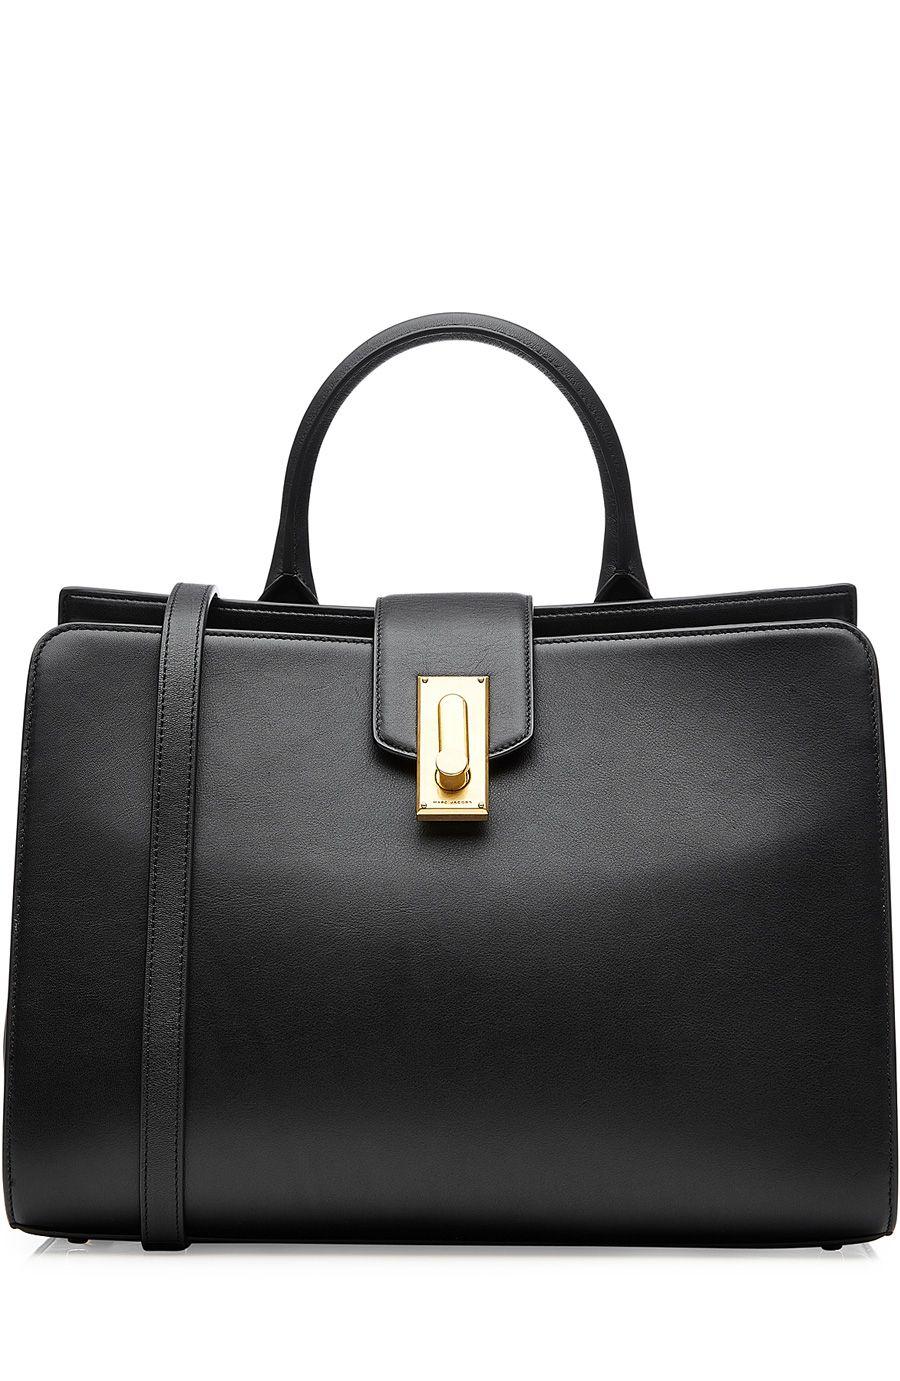 MARC JACOBS West End Medium Top Handle Shoulder Bag. #marcjacobs #bags #leather #lining #denim #metallic #shoulder bags #hand bags #